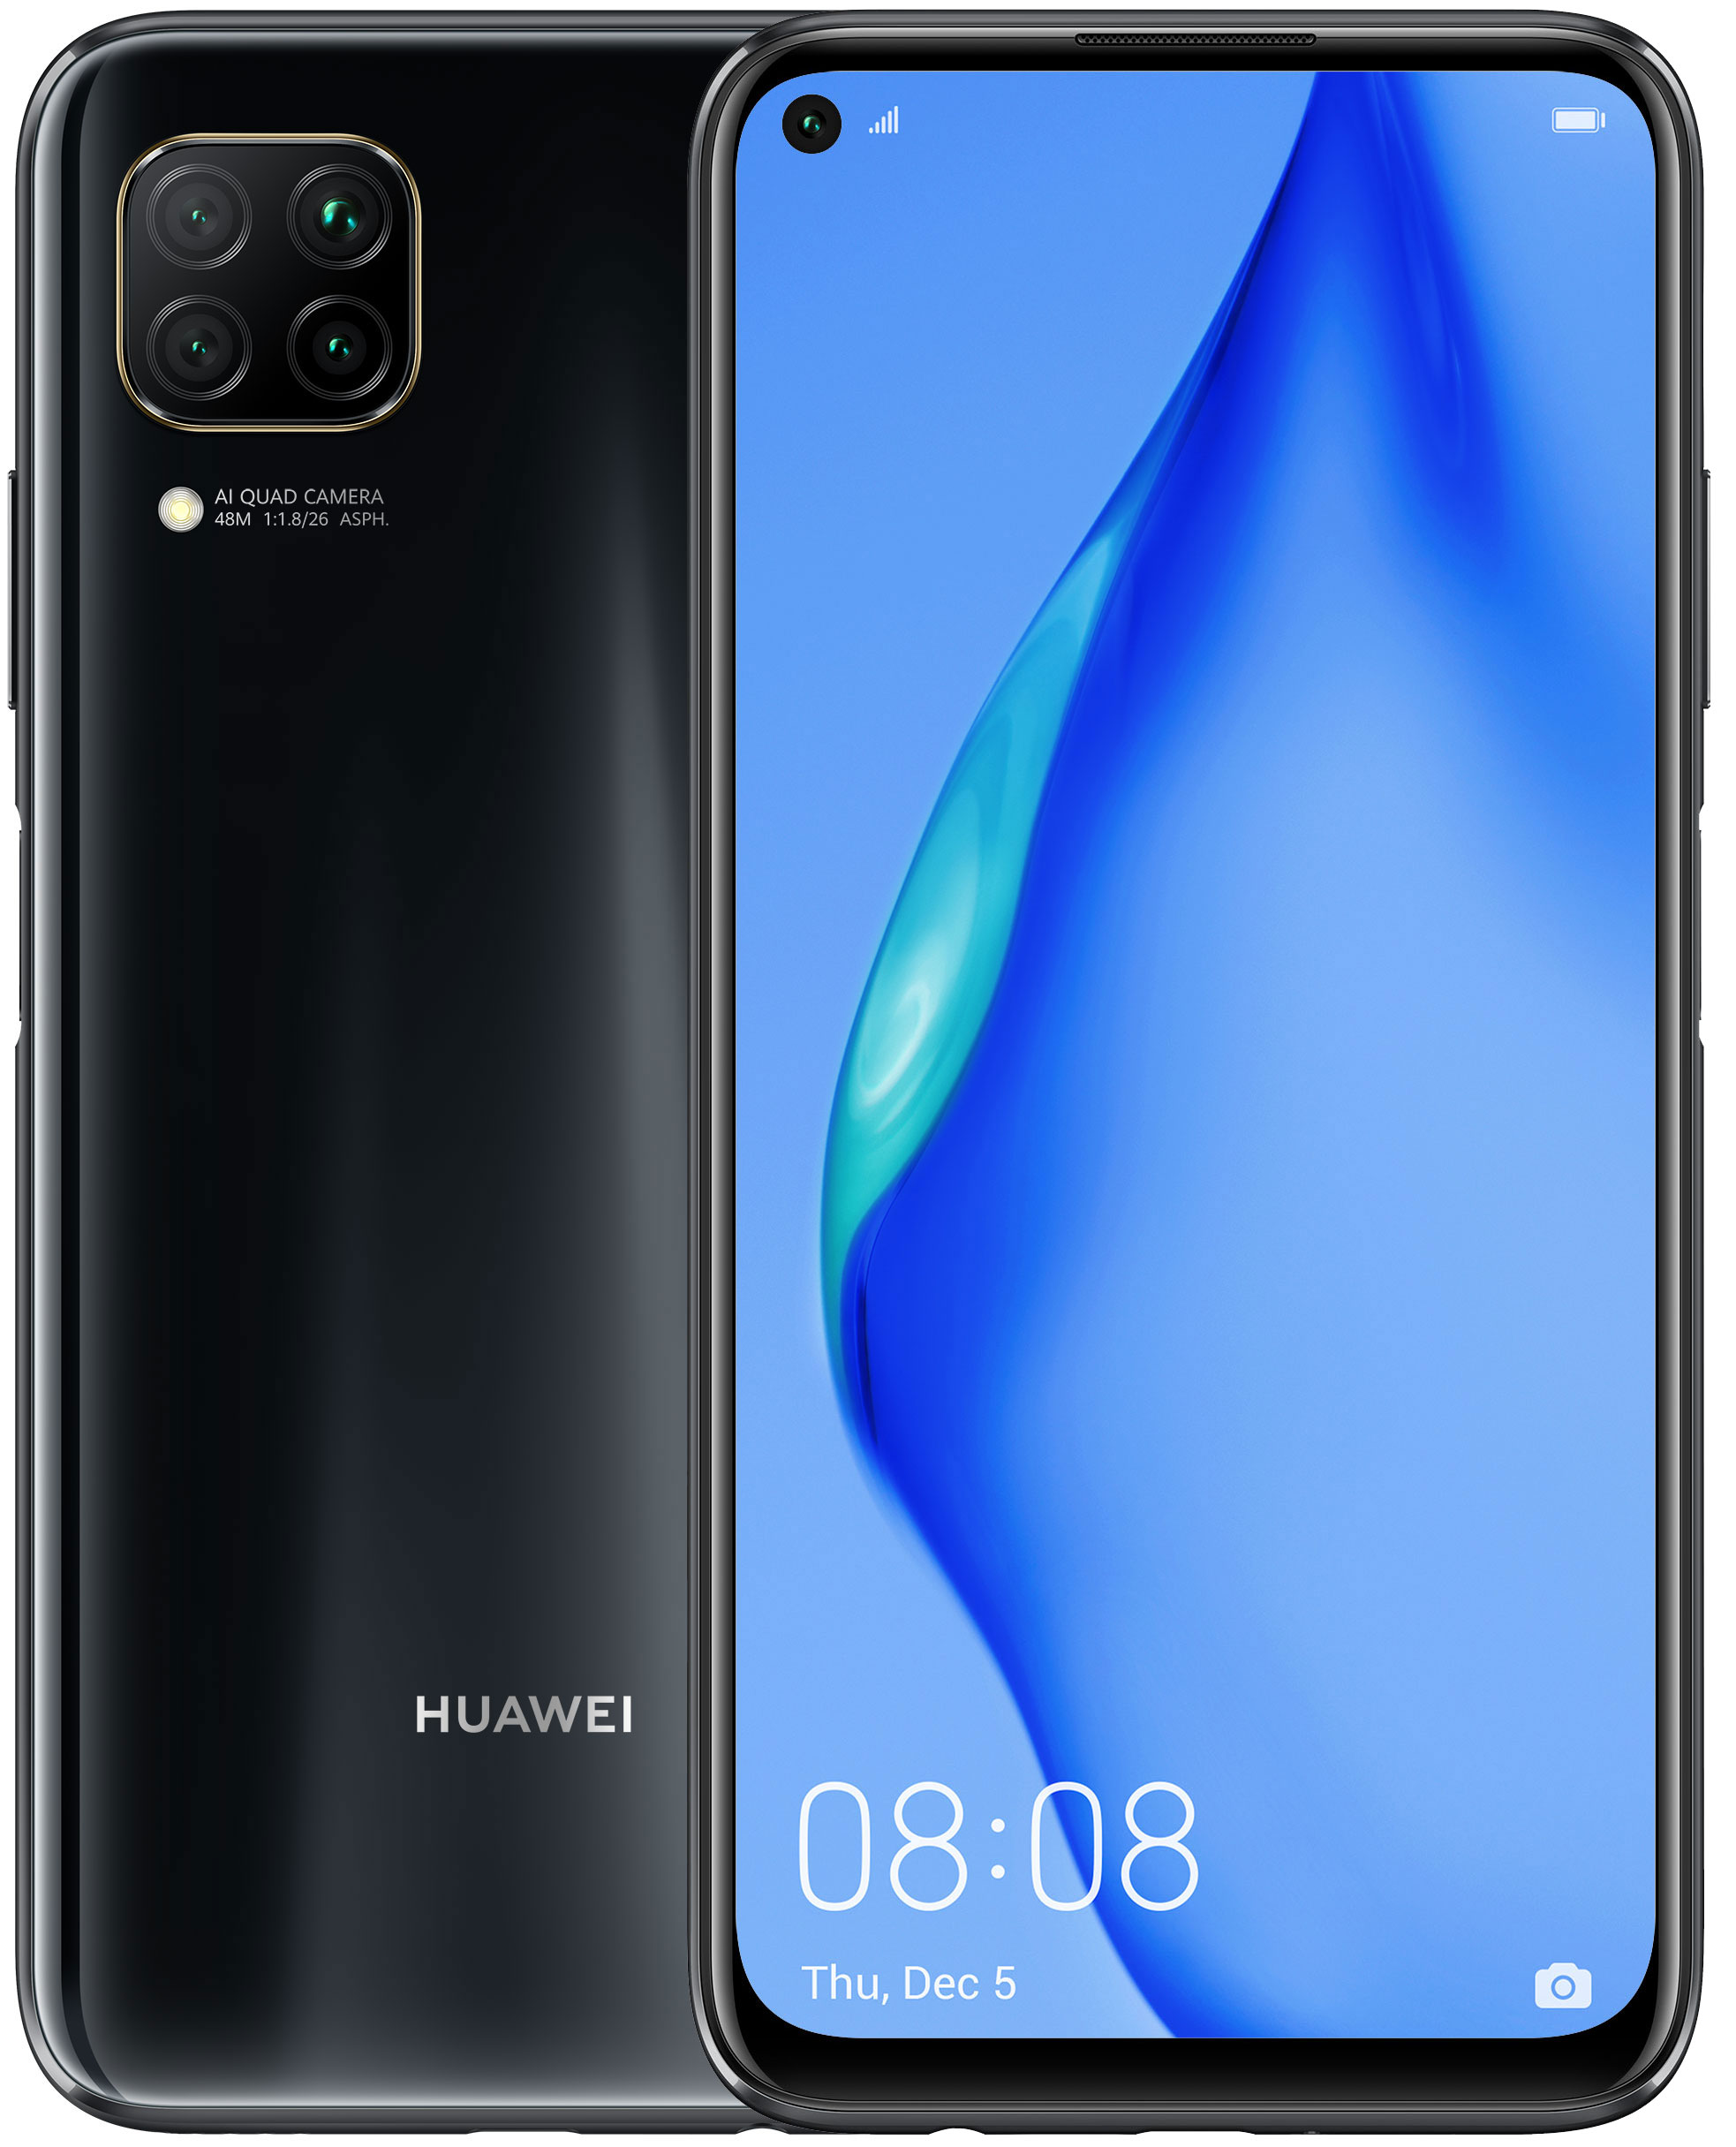 HUAWEI P40 LITE 128 GB BLACK + PARLANTE HUAWEI HW2020